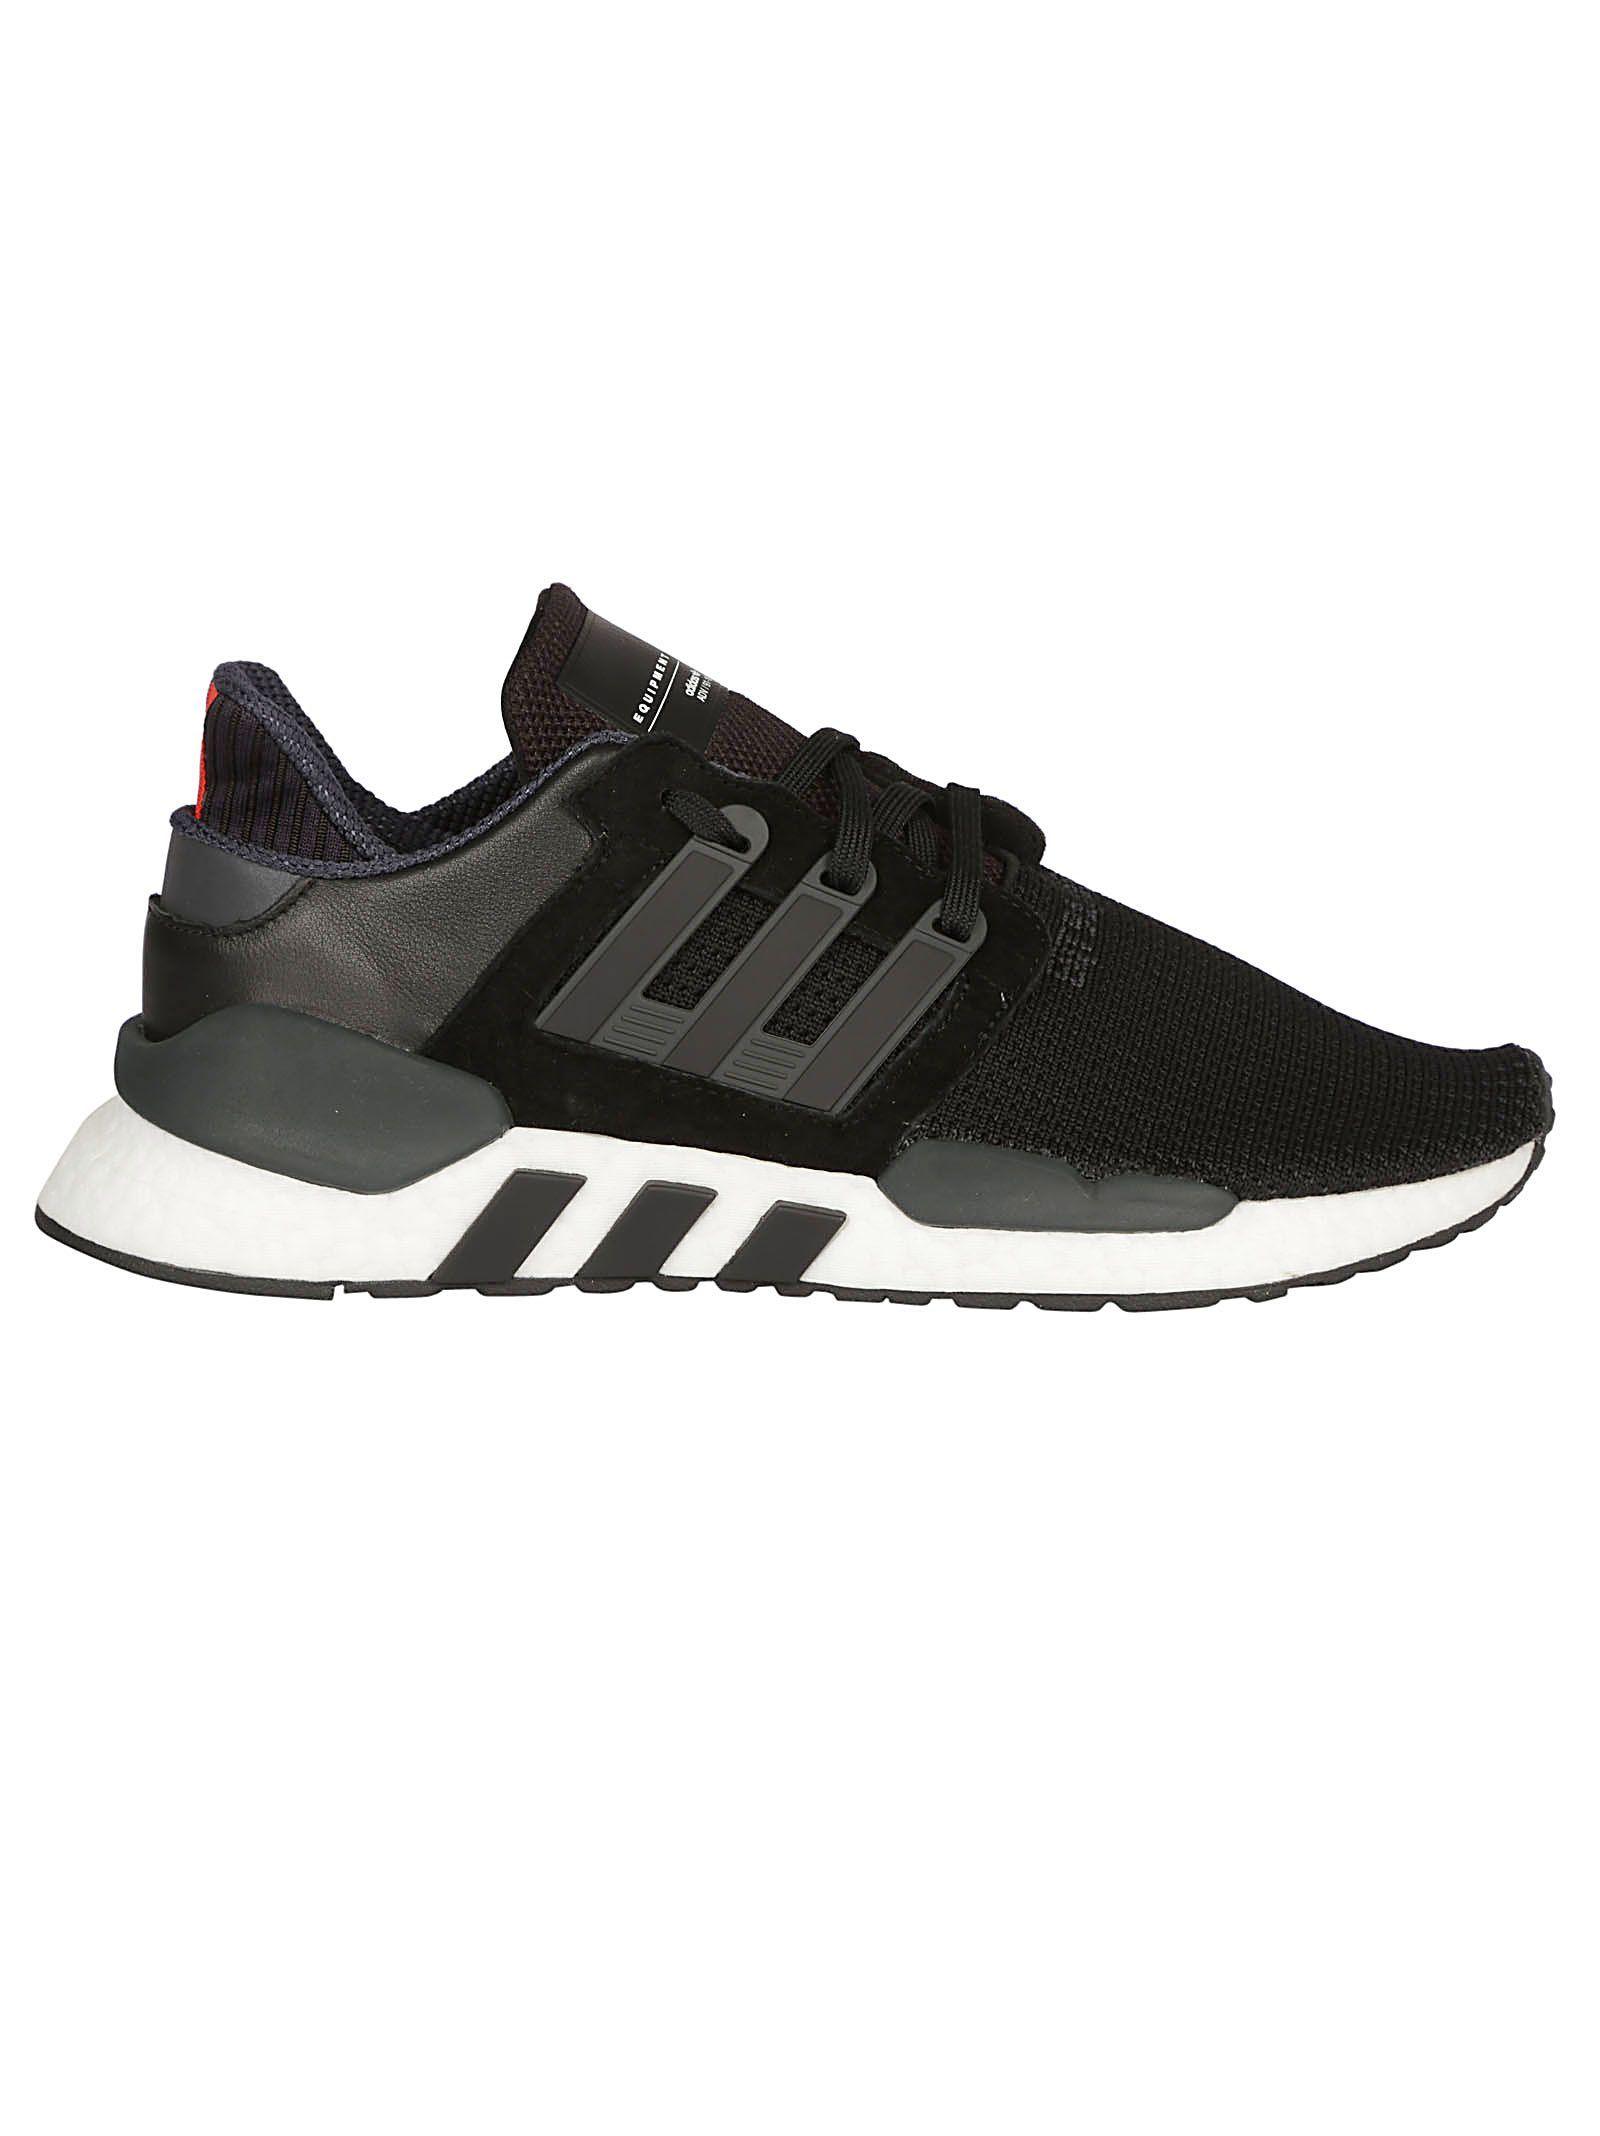 adidas equip shoes adidas Sale   Deals